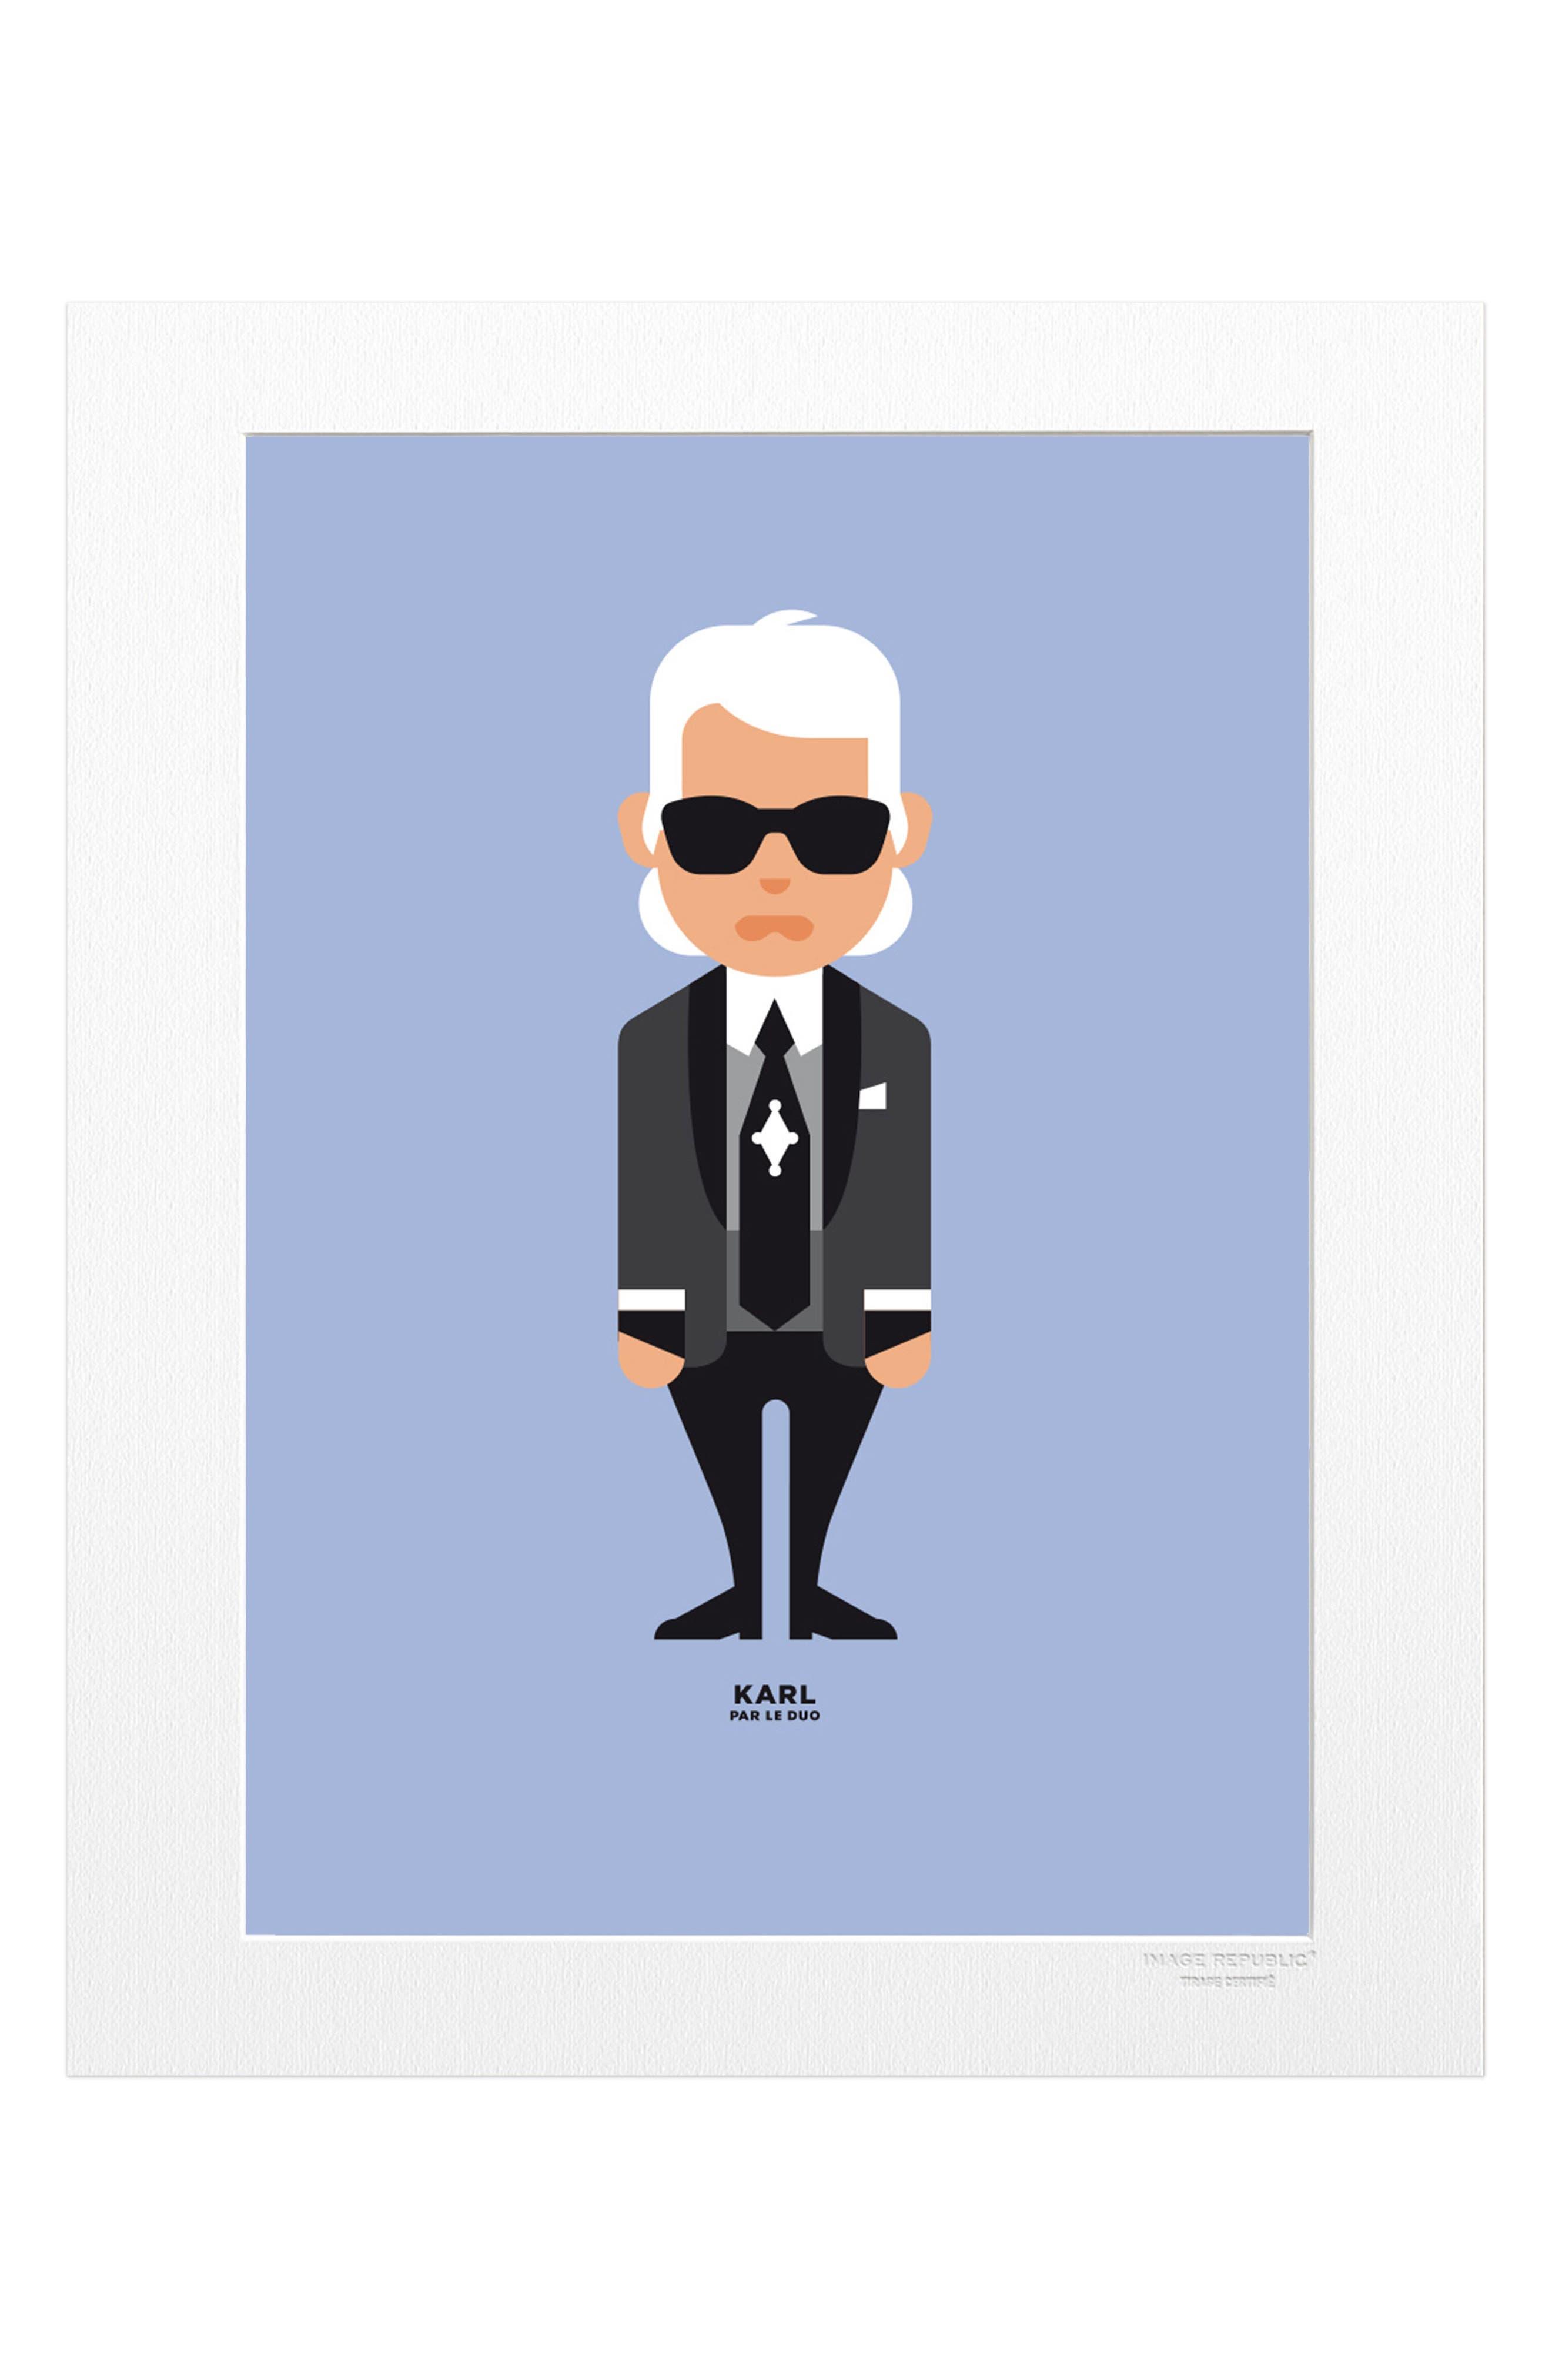 Image Republic Le Duo Karl Lagerfeld Print